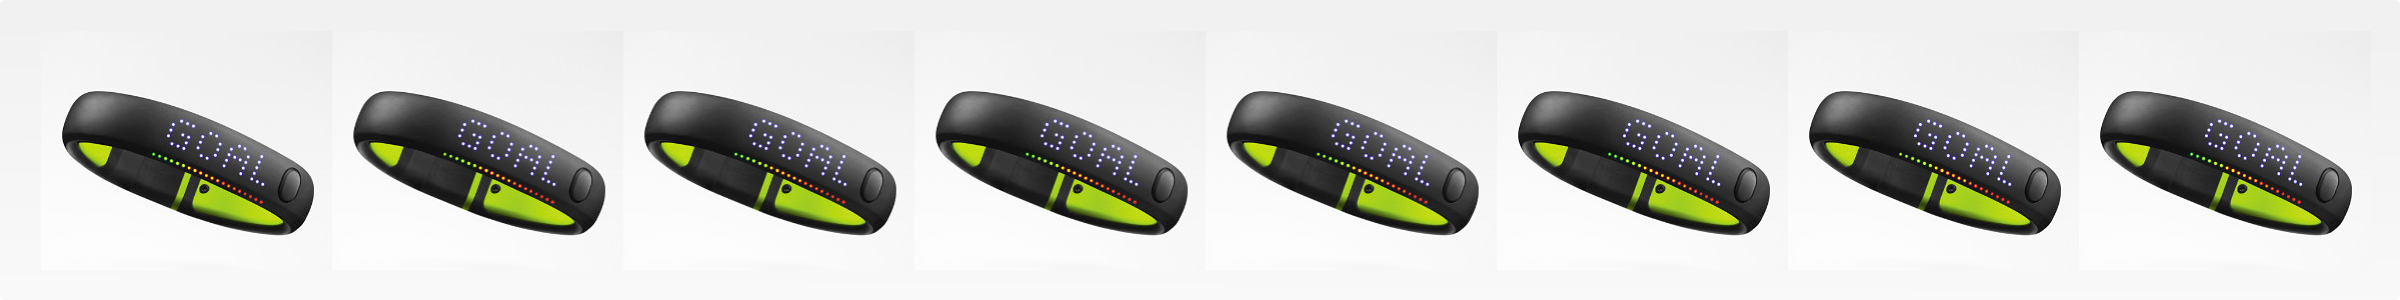 Nike+ SE Banner